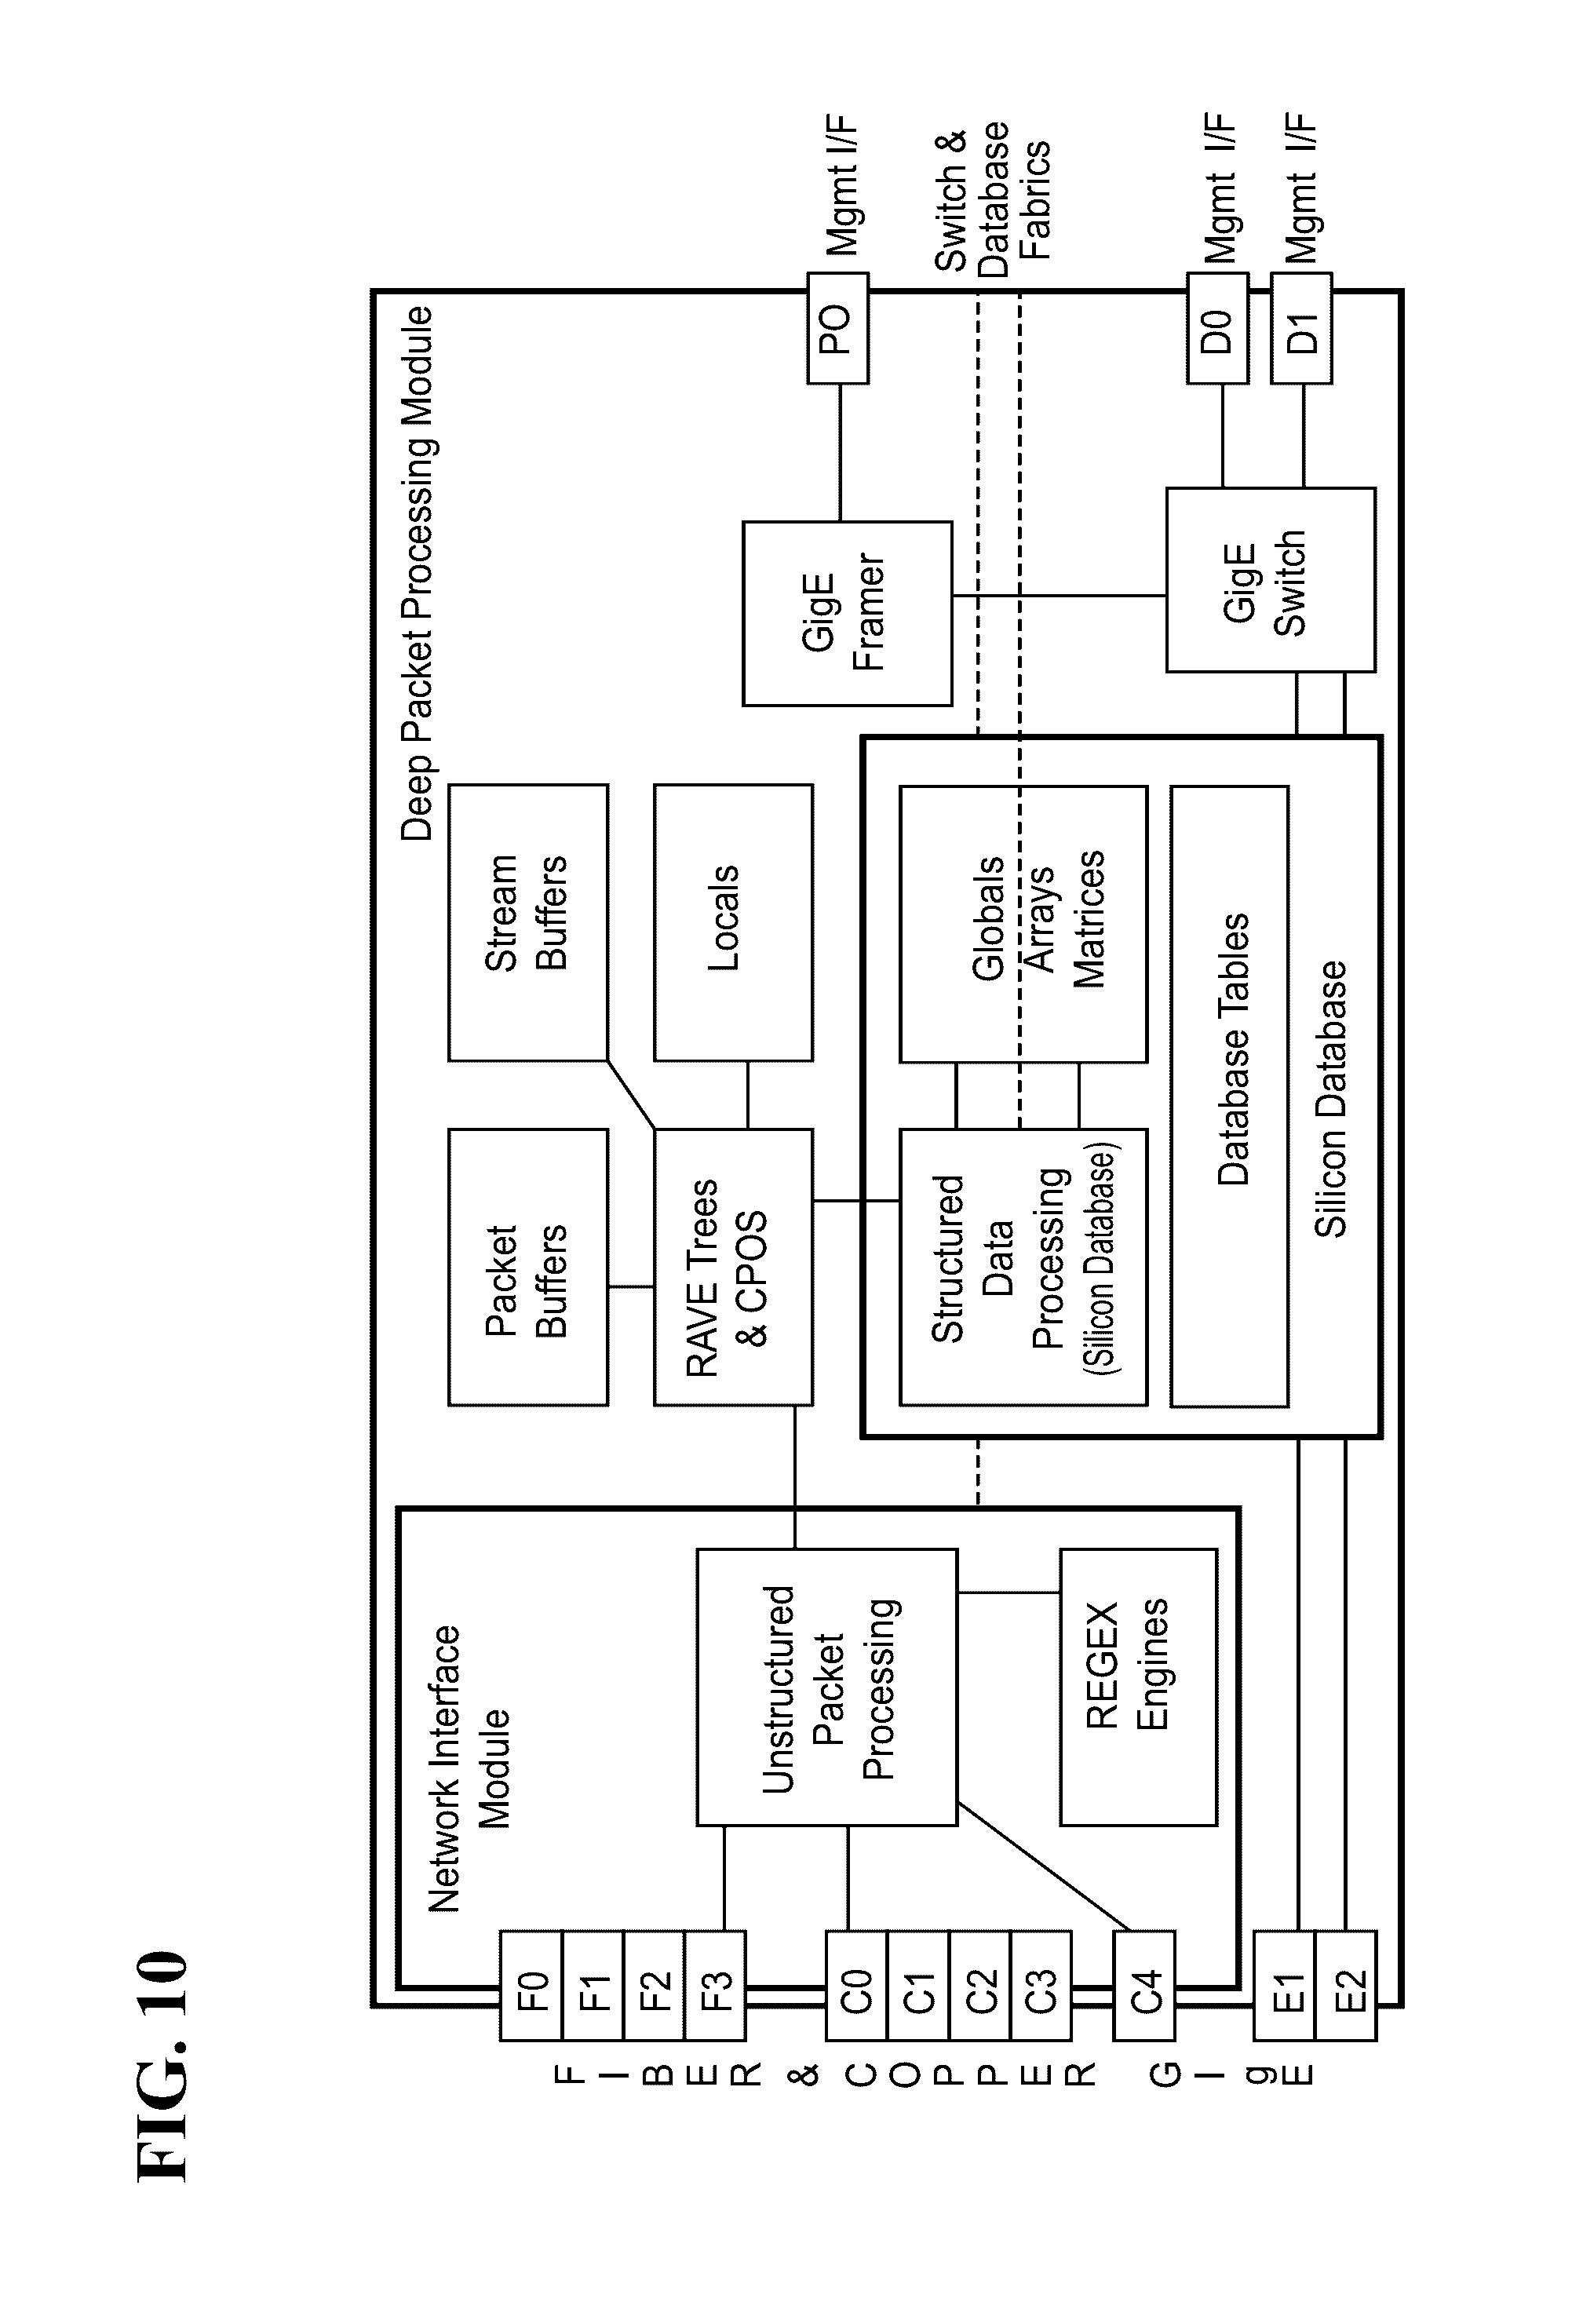 Patent US 9,537,824 B2